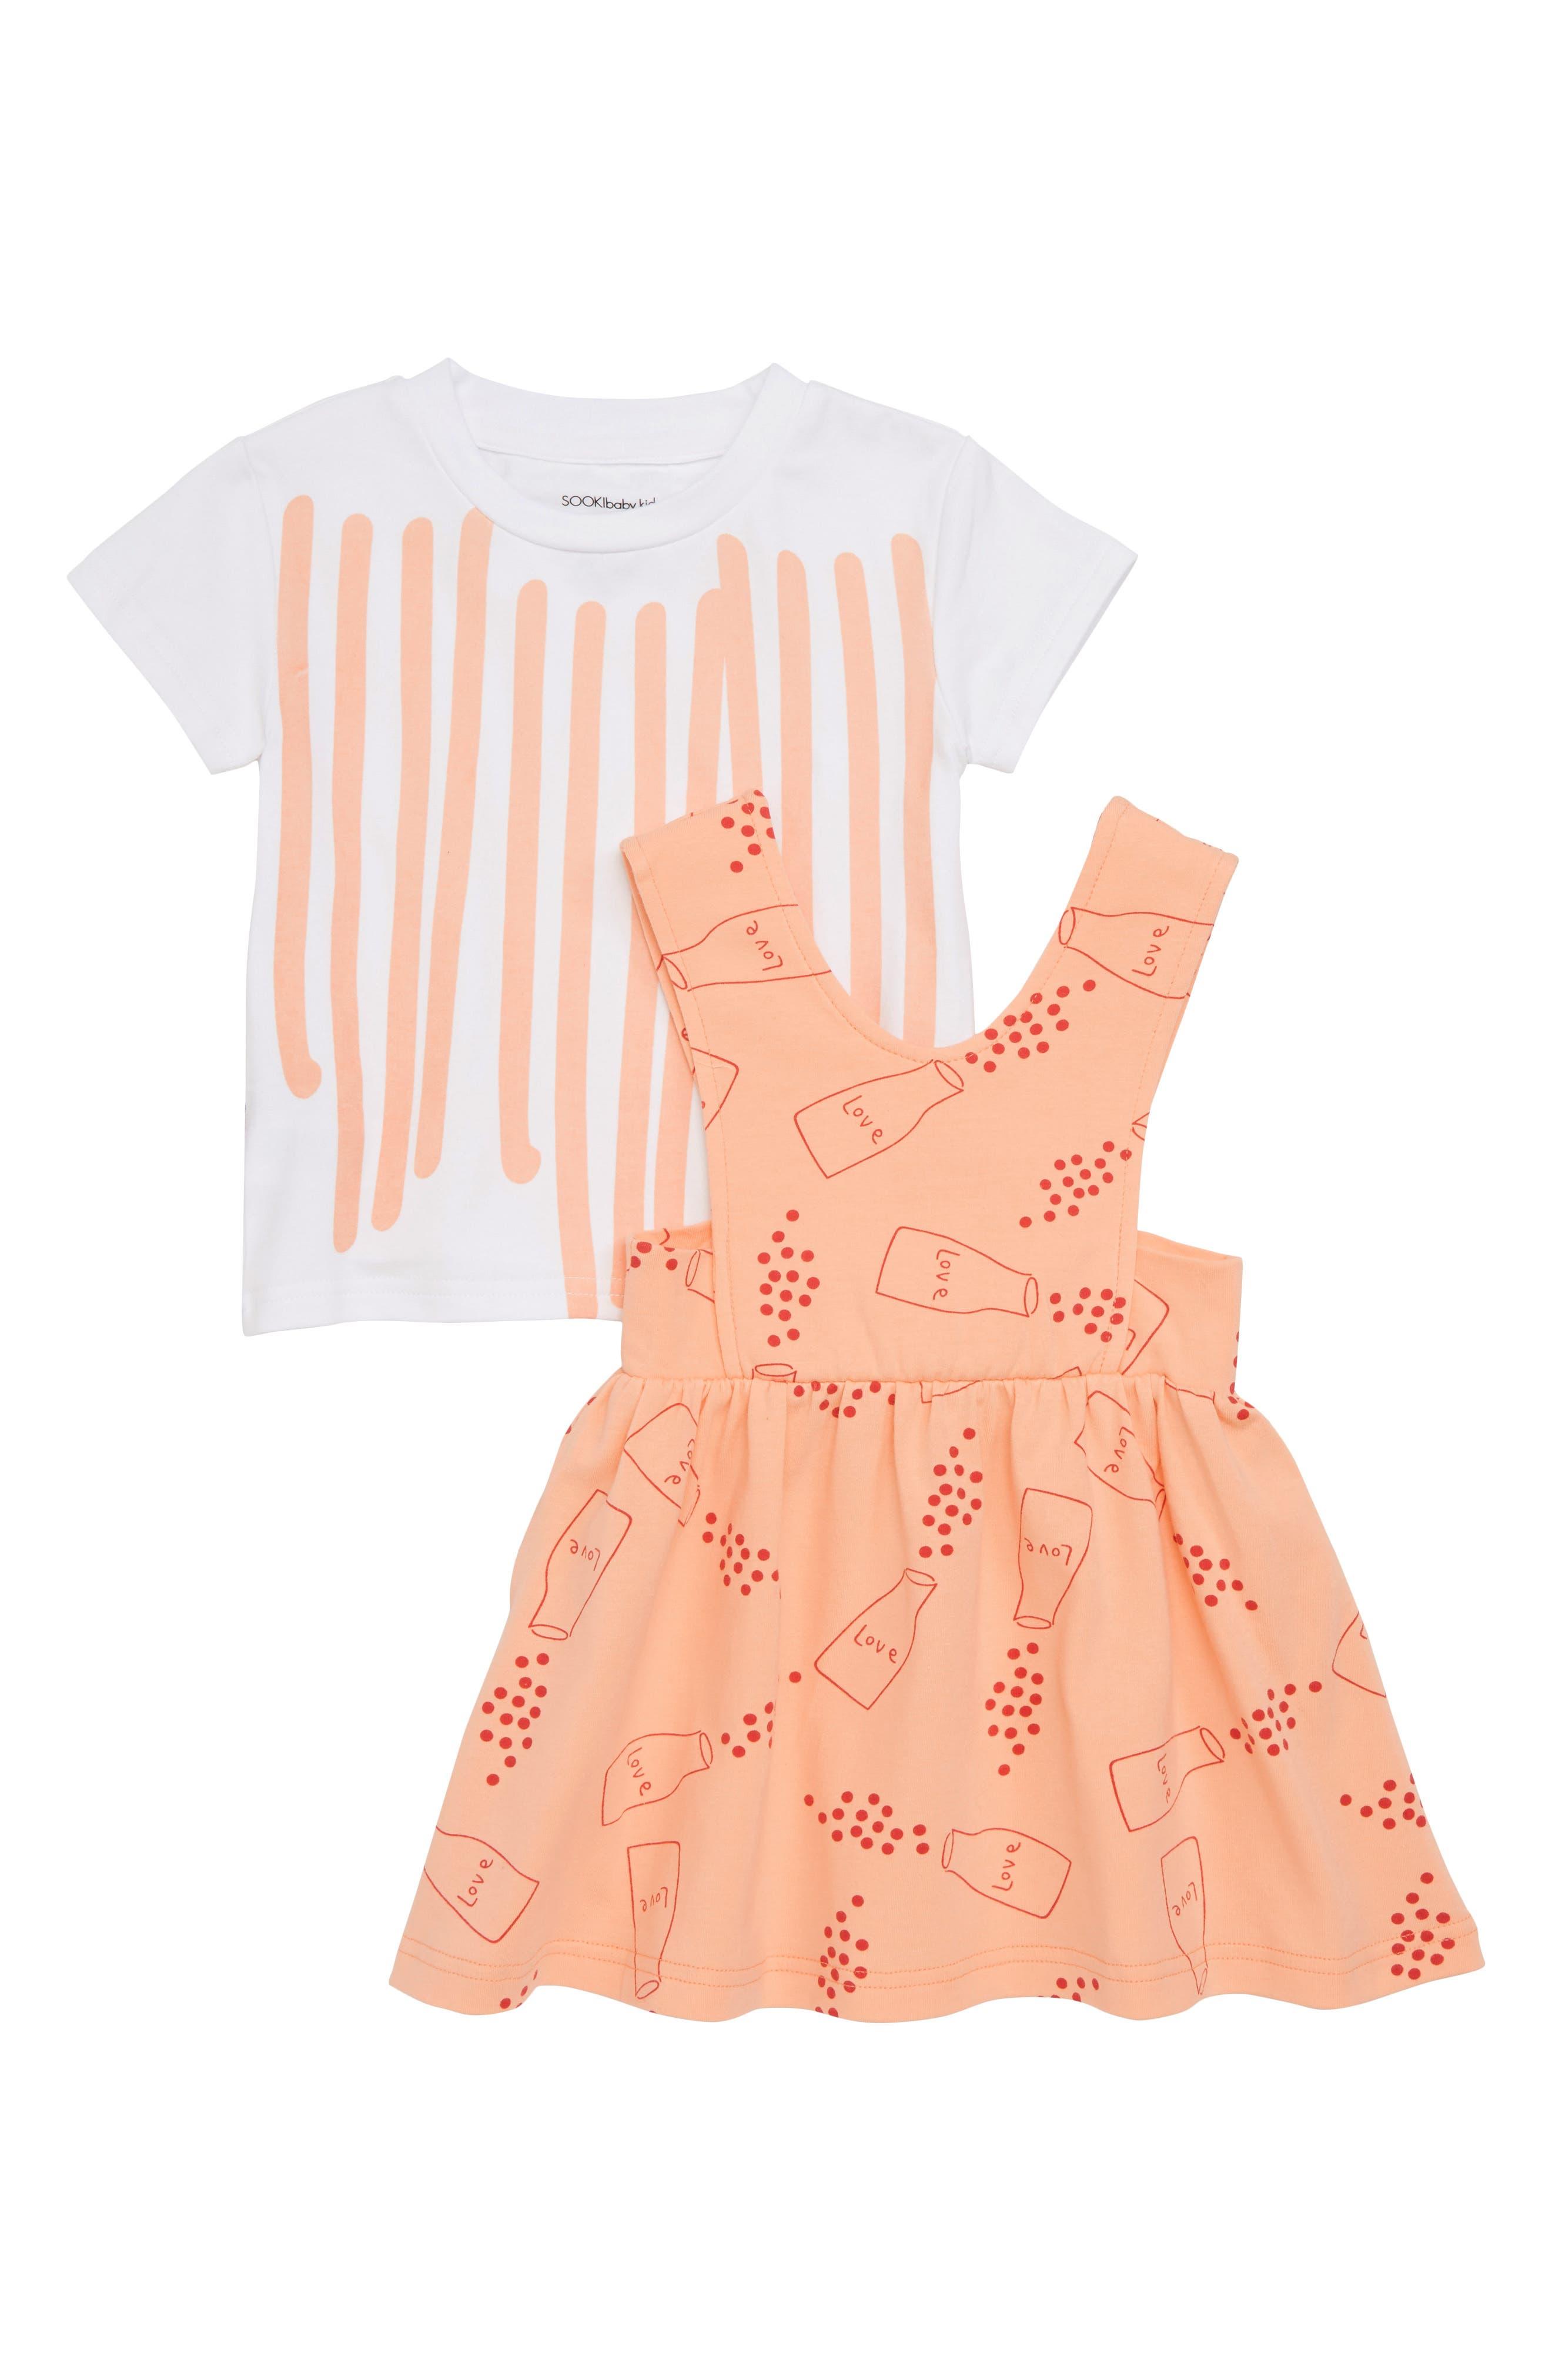 Stripe Tee & Sprinkle Love Pinafore Dress Set,                             Main thumbnail 1, color,                             109